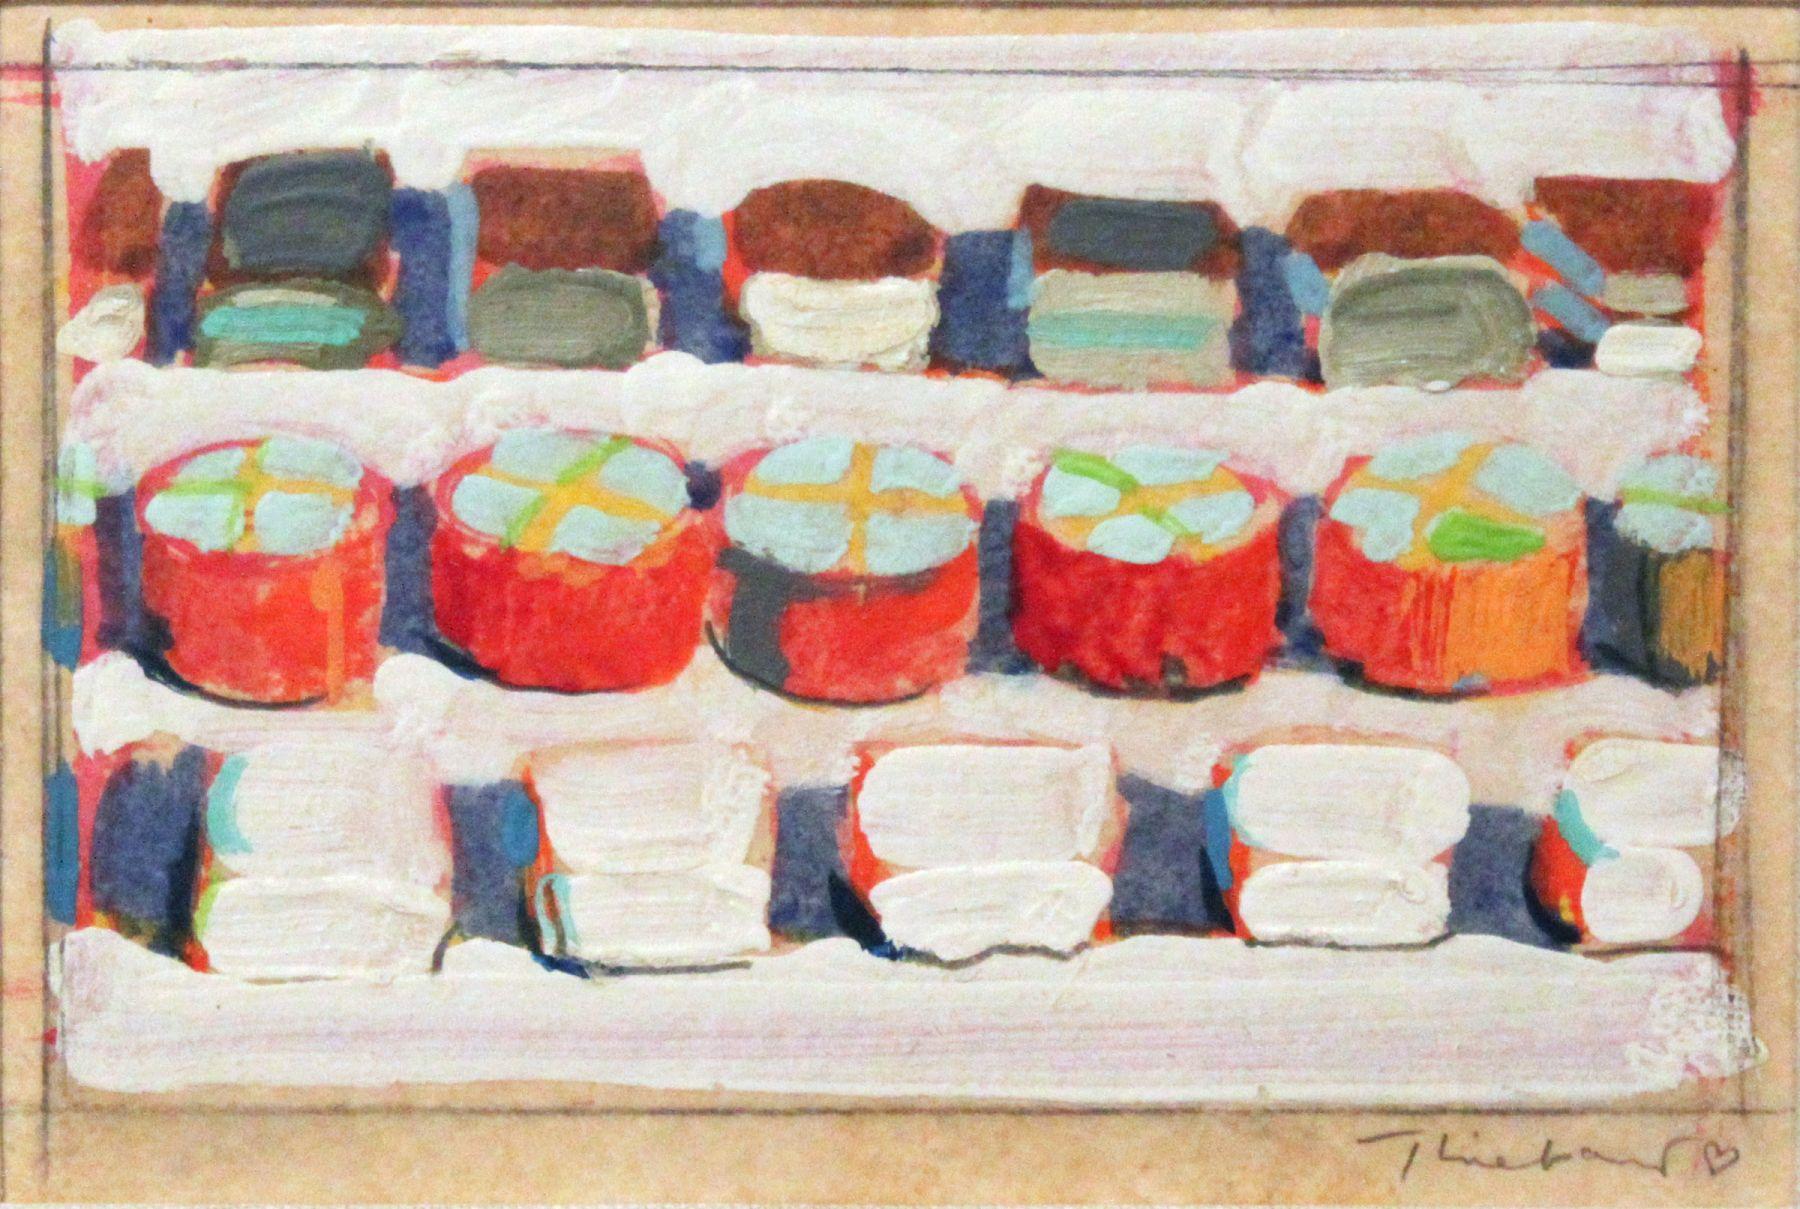 Wayne Thiebaud, Candy Chunks, c. 1970